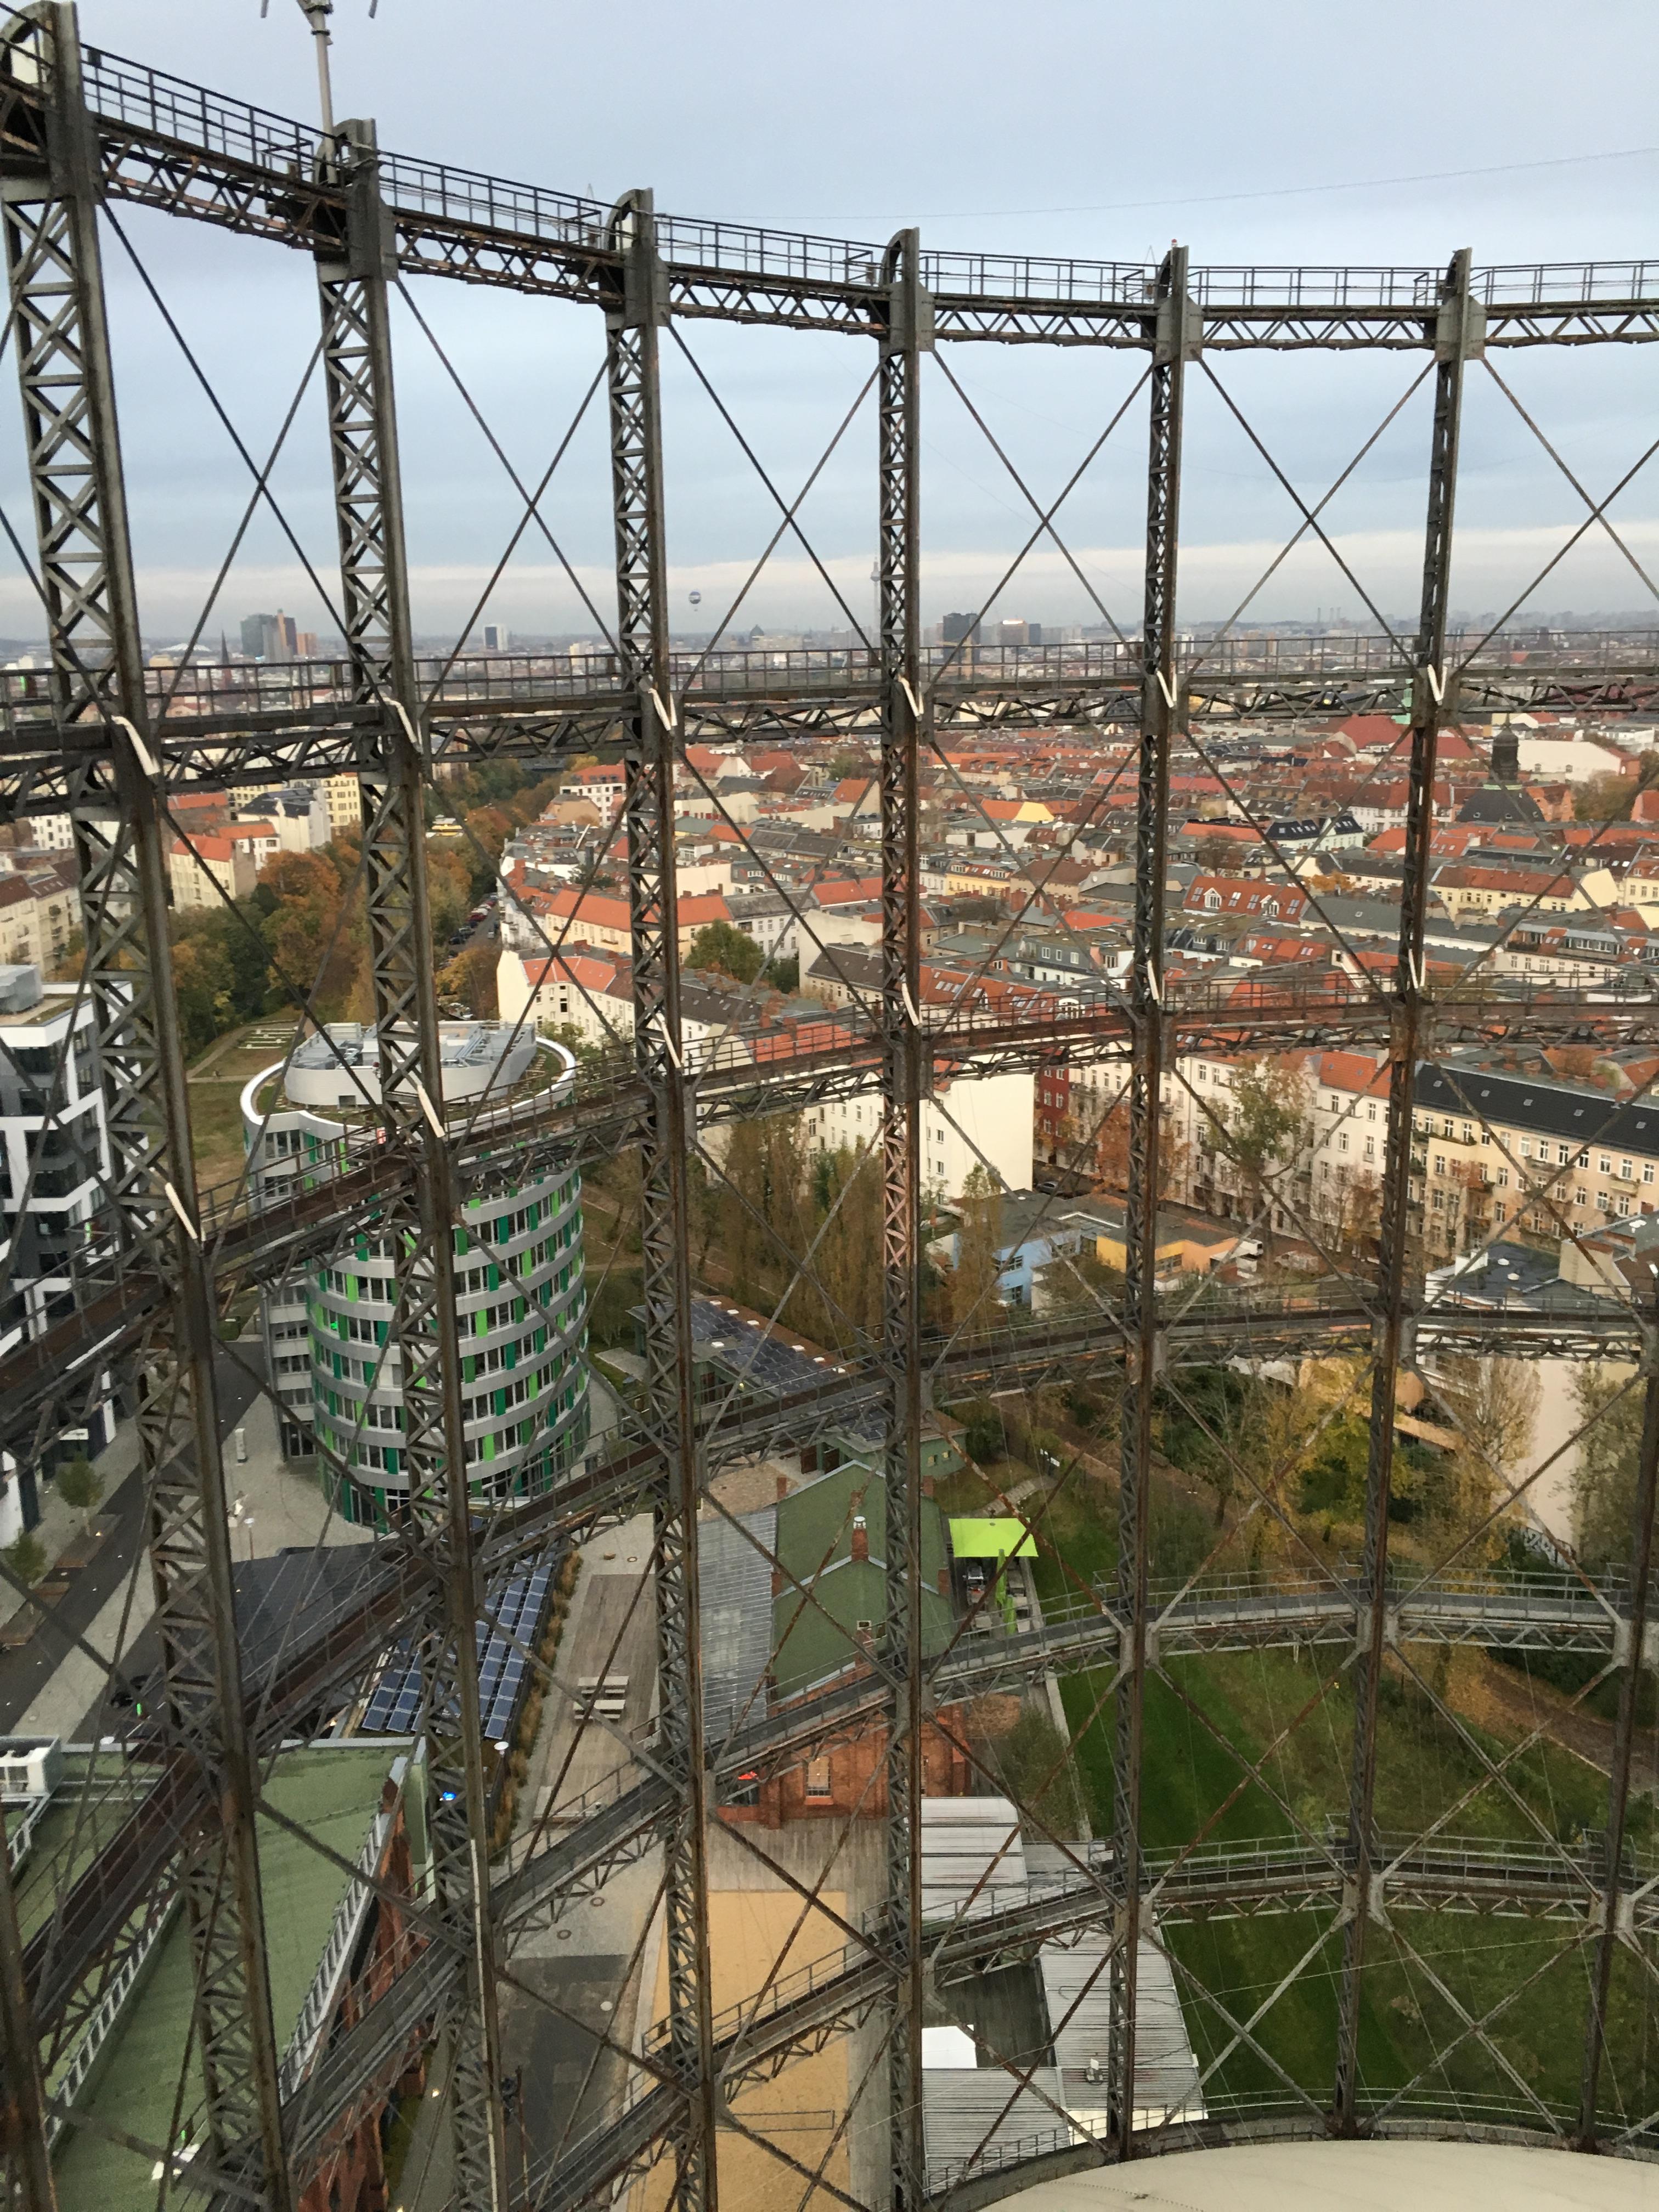 andysparkles-Monatsrückblick im Oktober-Gasometer Berlin